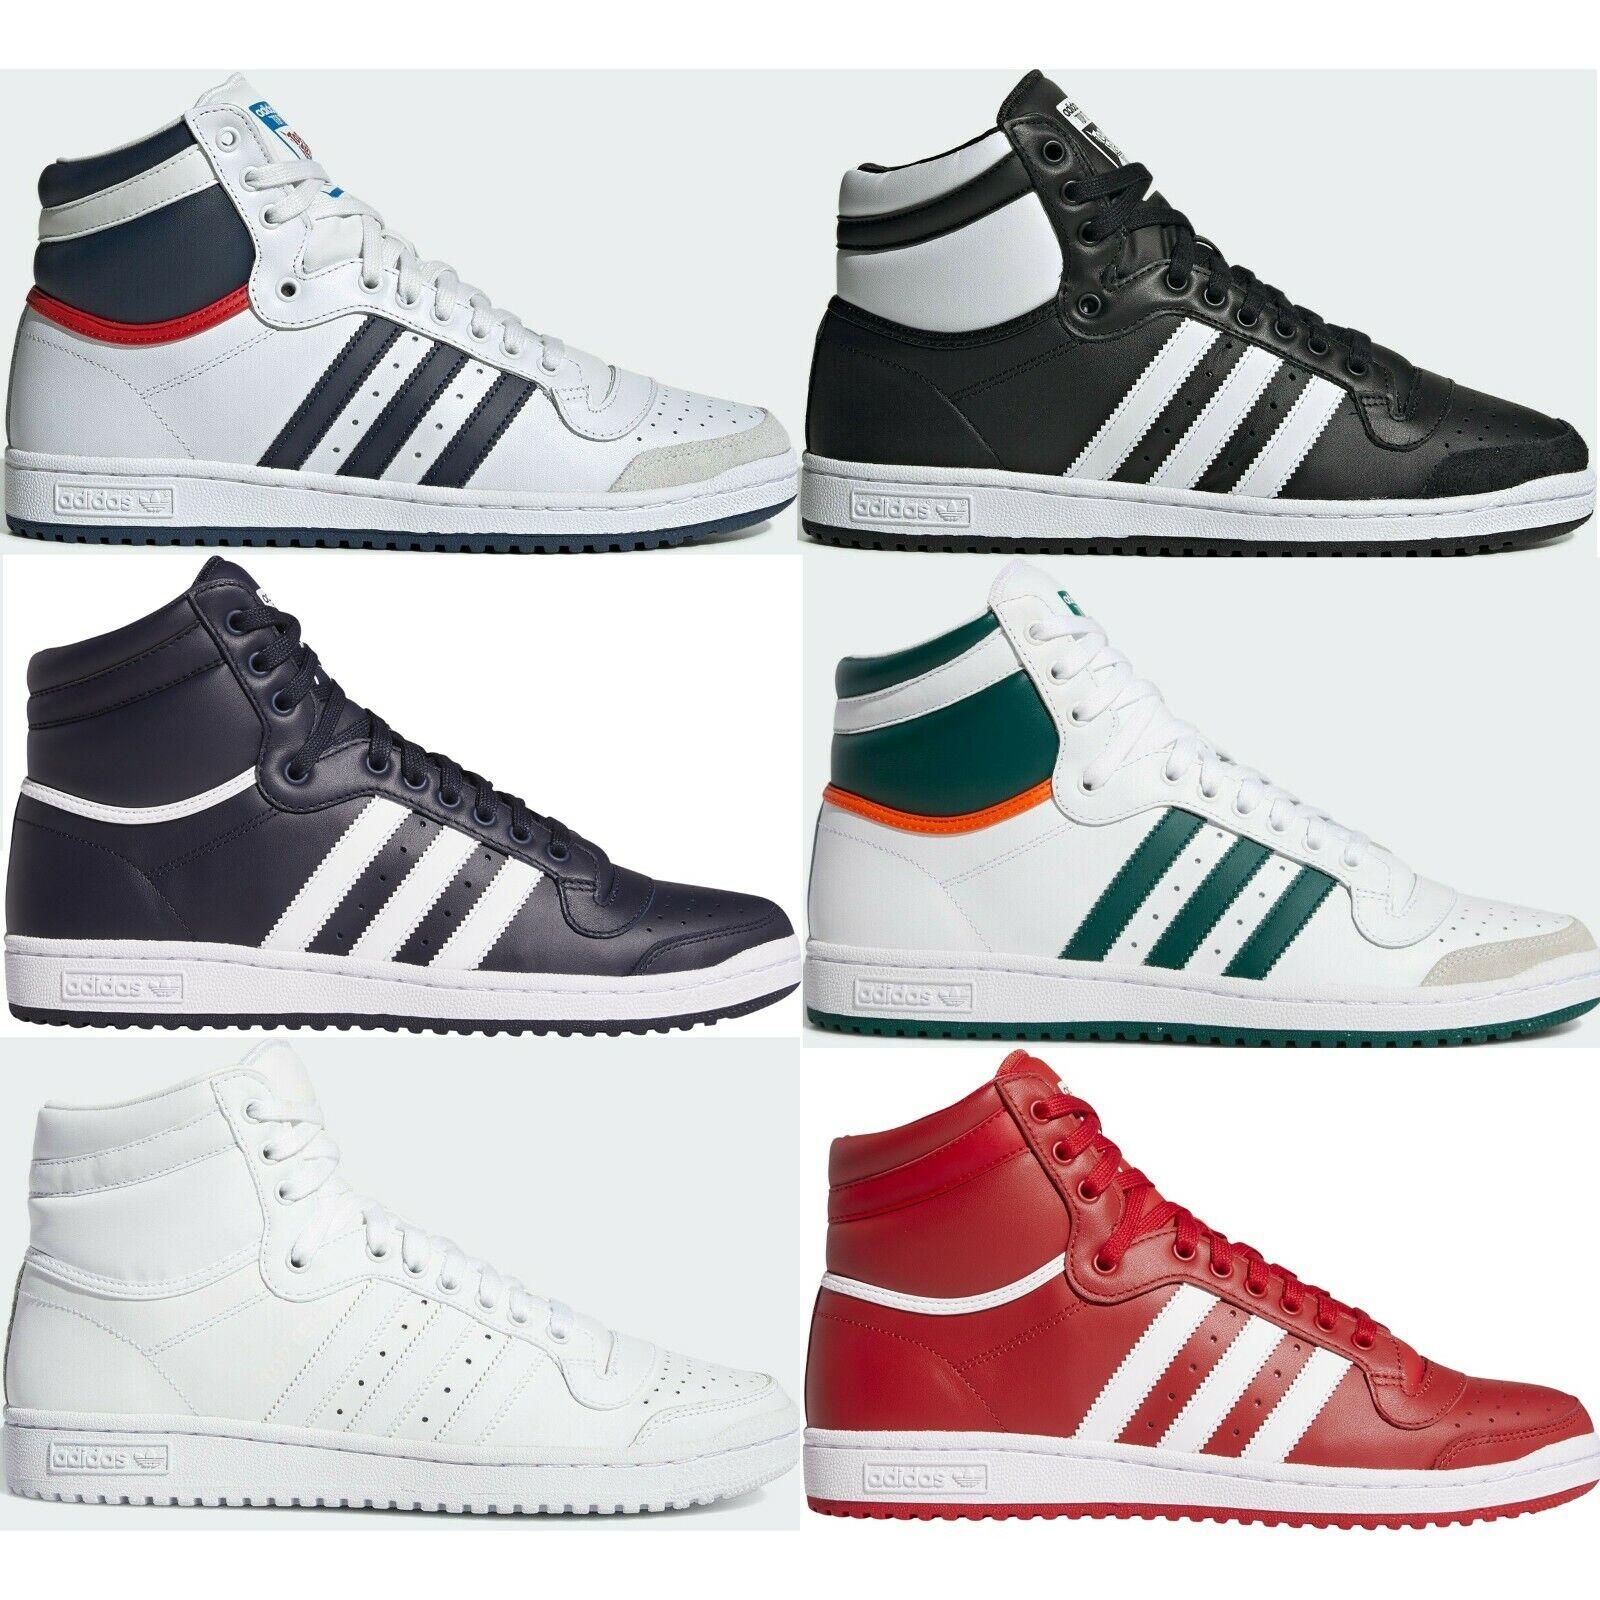 Adidas Hardcourt Hi black or brown Men's Shoes Lifestyle